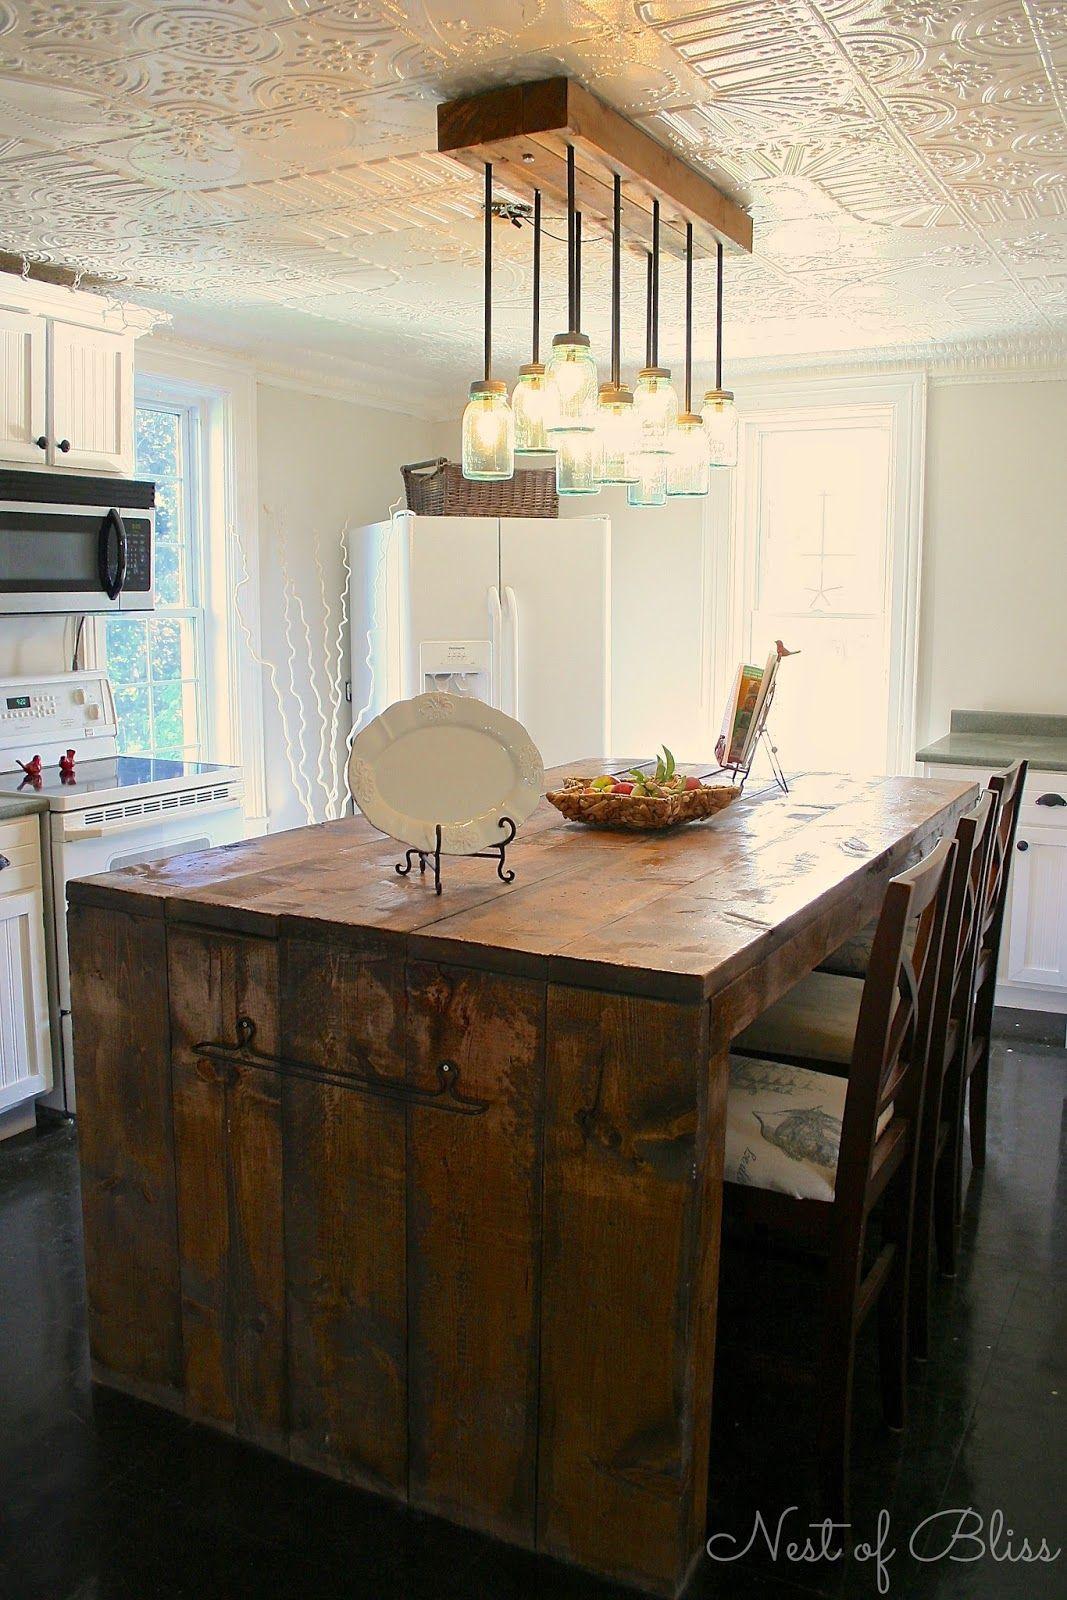 img 7428 jpg 1 067 1 600 pixels decoratingkitchenideasandmore rustic kitchen island rustic on kitchen island ideas cheap id=28854